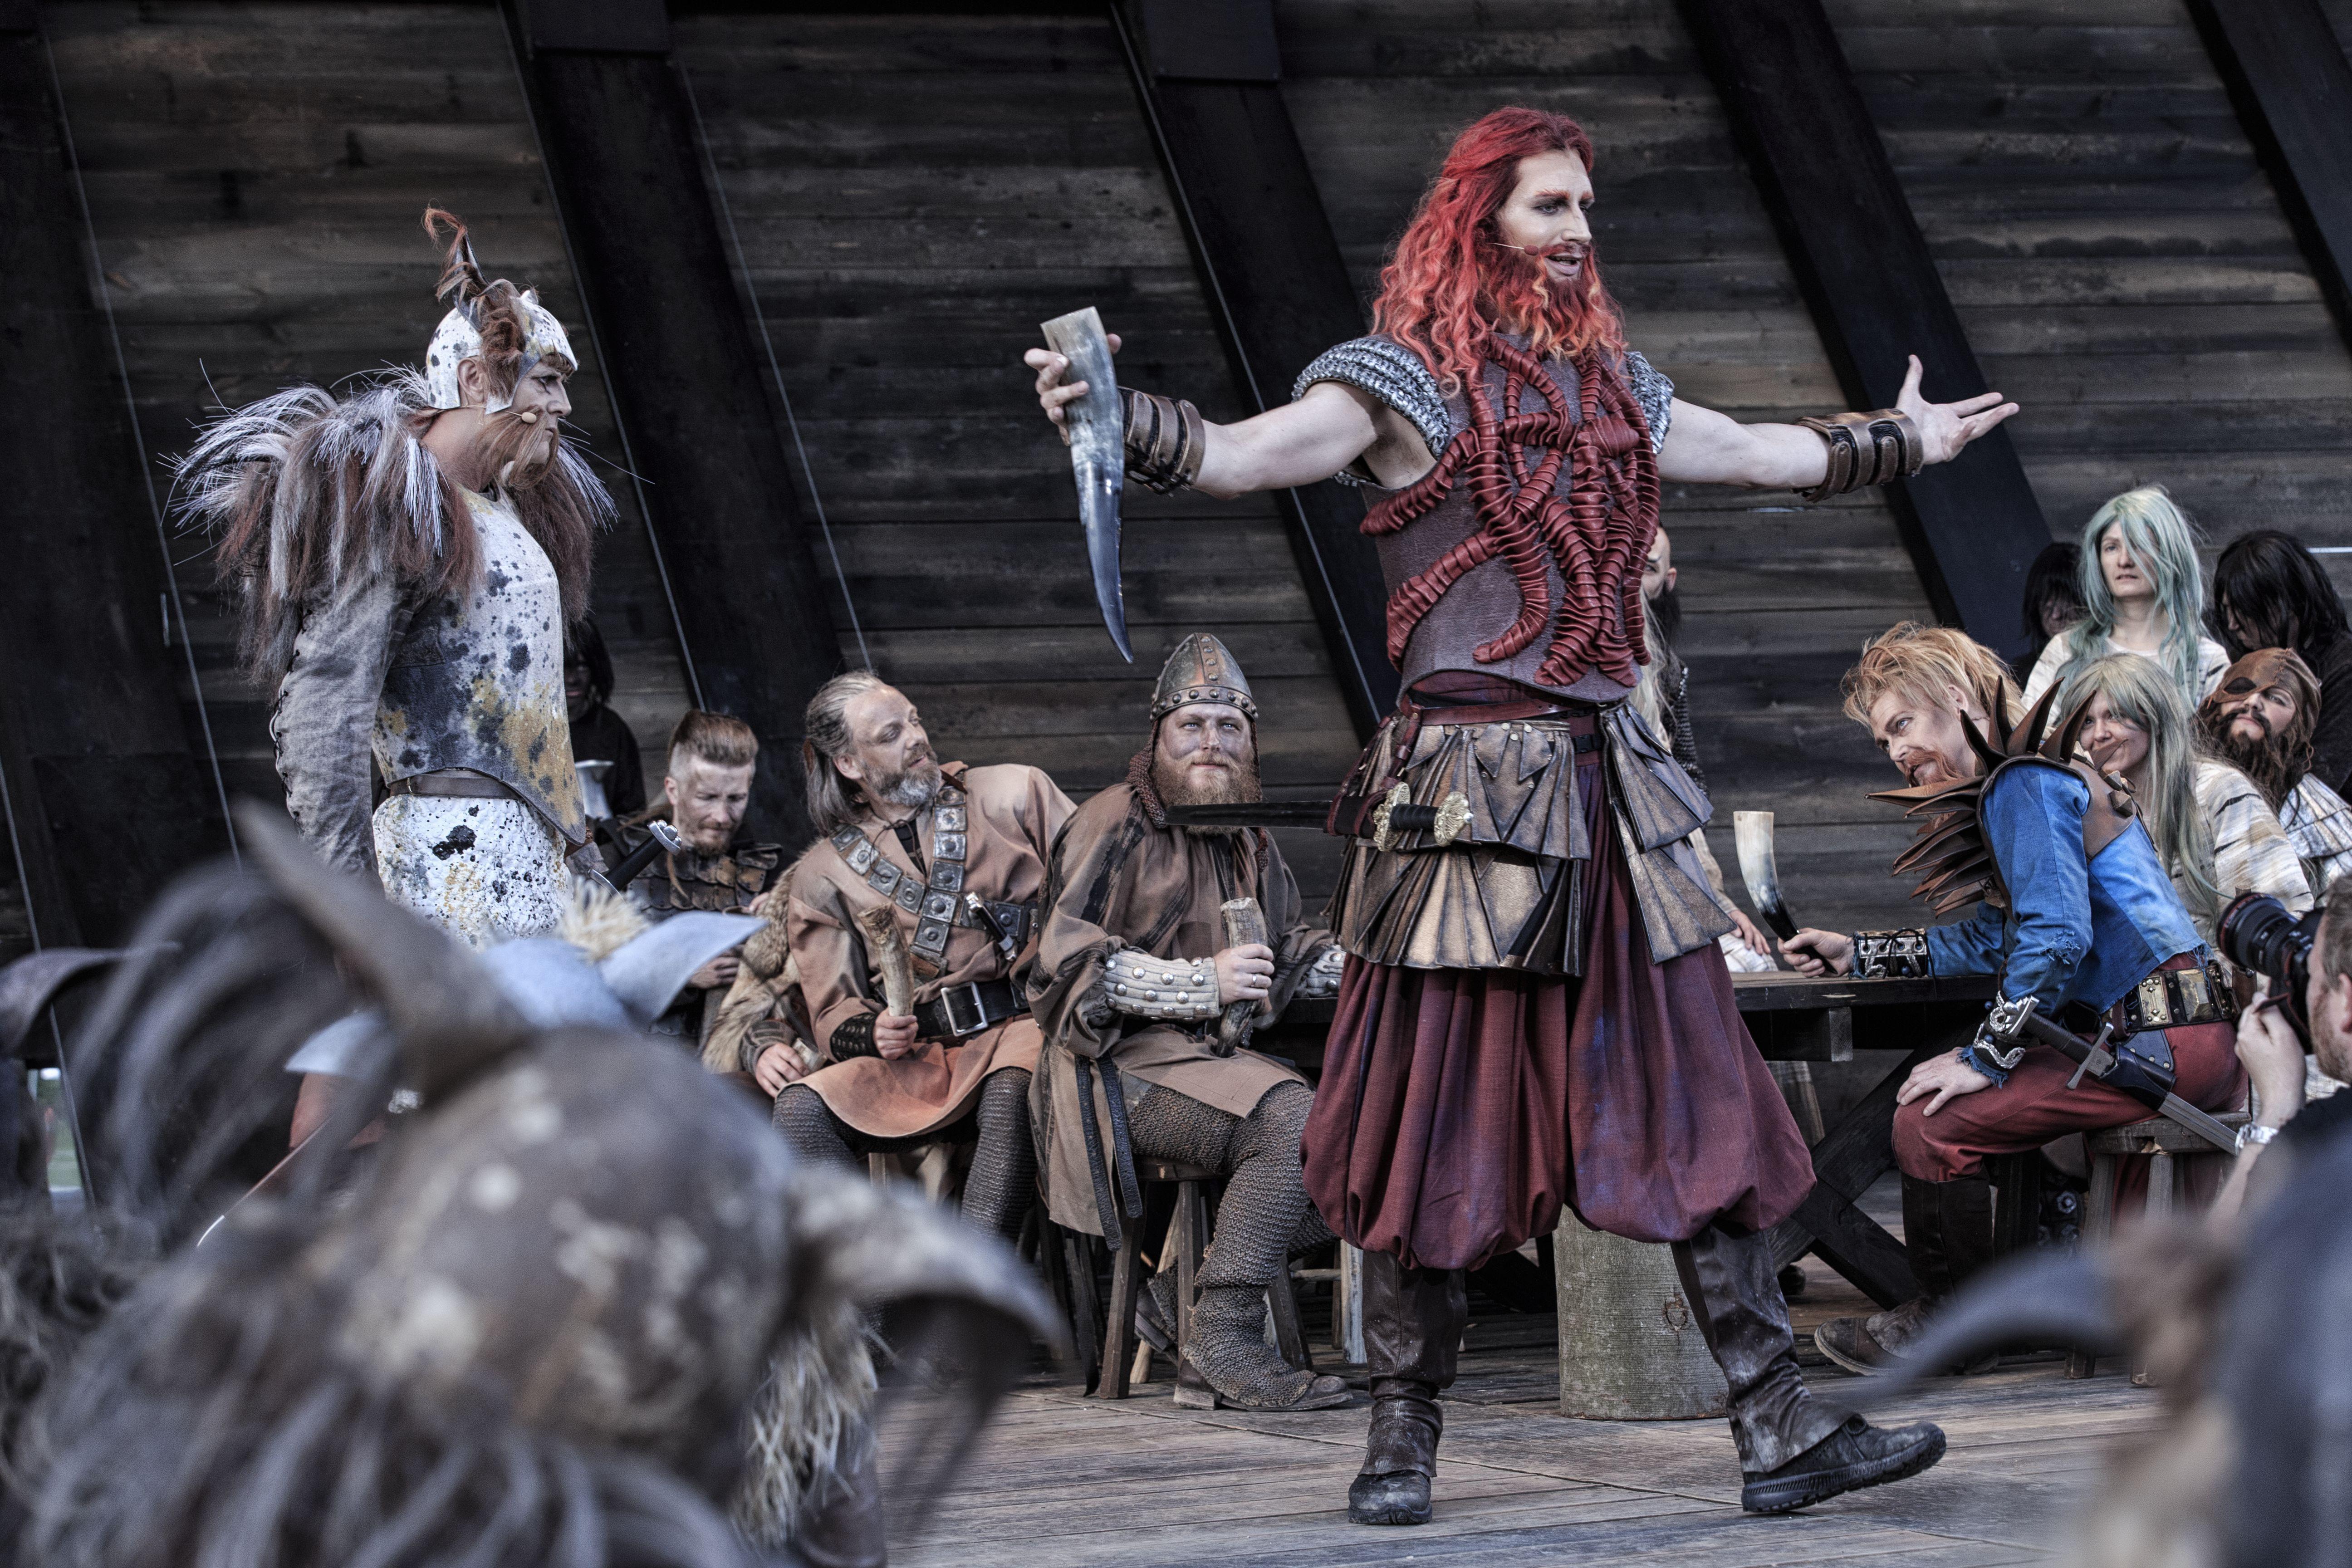 røde orm, frans bengtsson, vikinger, sagaer, moesgaard museum, dyrehaven, det kongelige teater, andreas jebro, teater, vikingeskib, skuespil